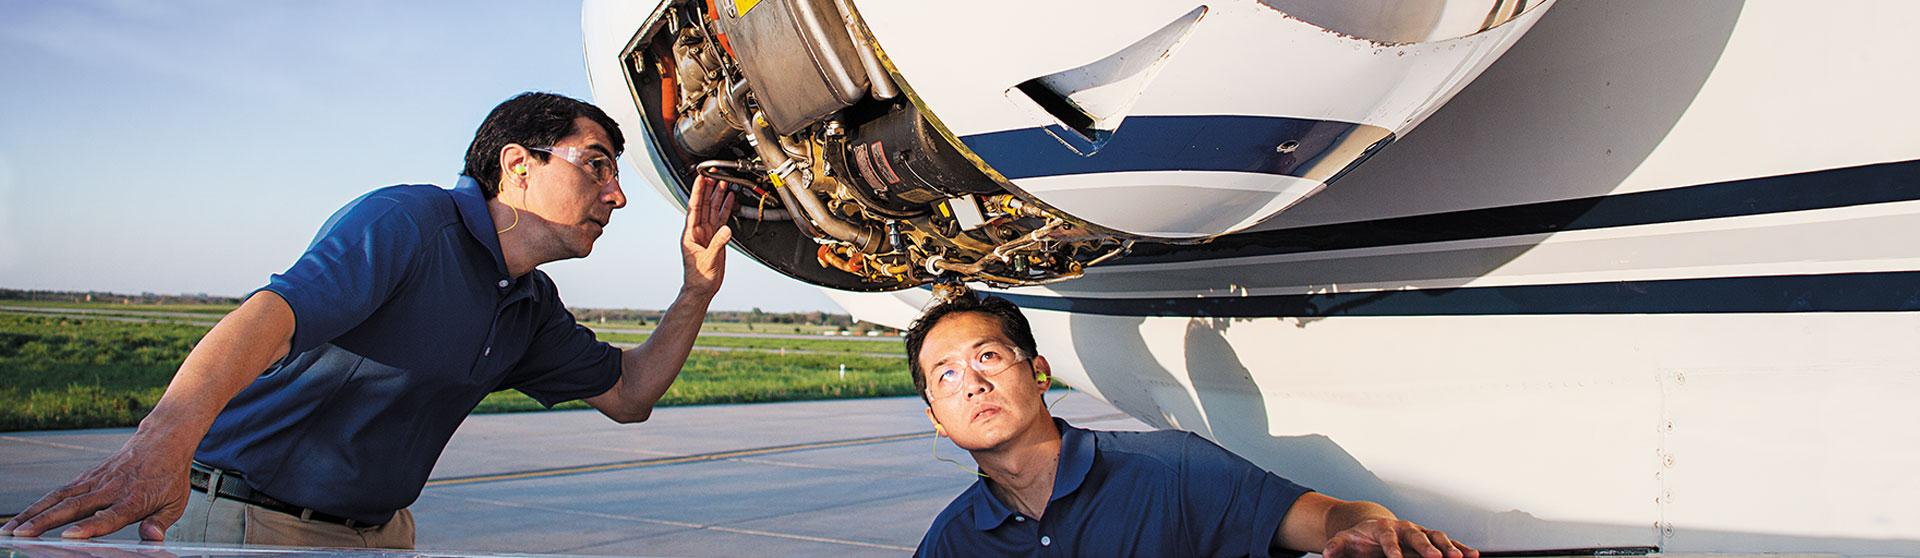 Honeywell TFE731 Engine Repair & Overhaul Services - Dallas Airmotive